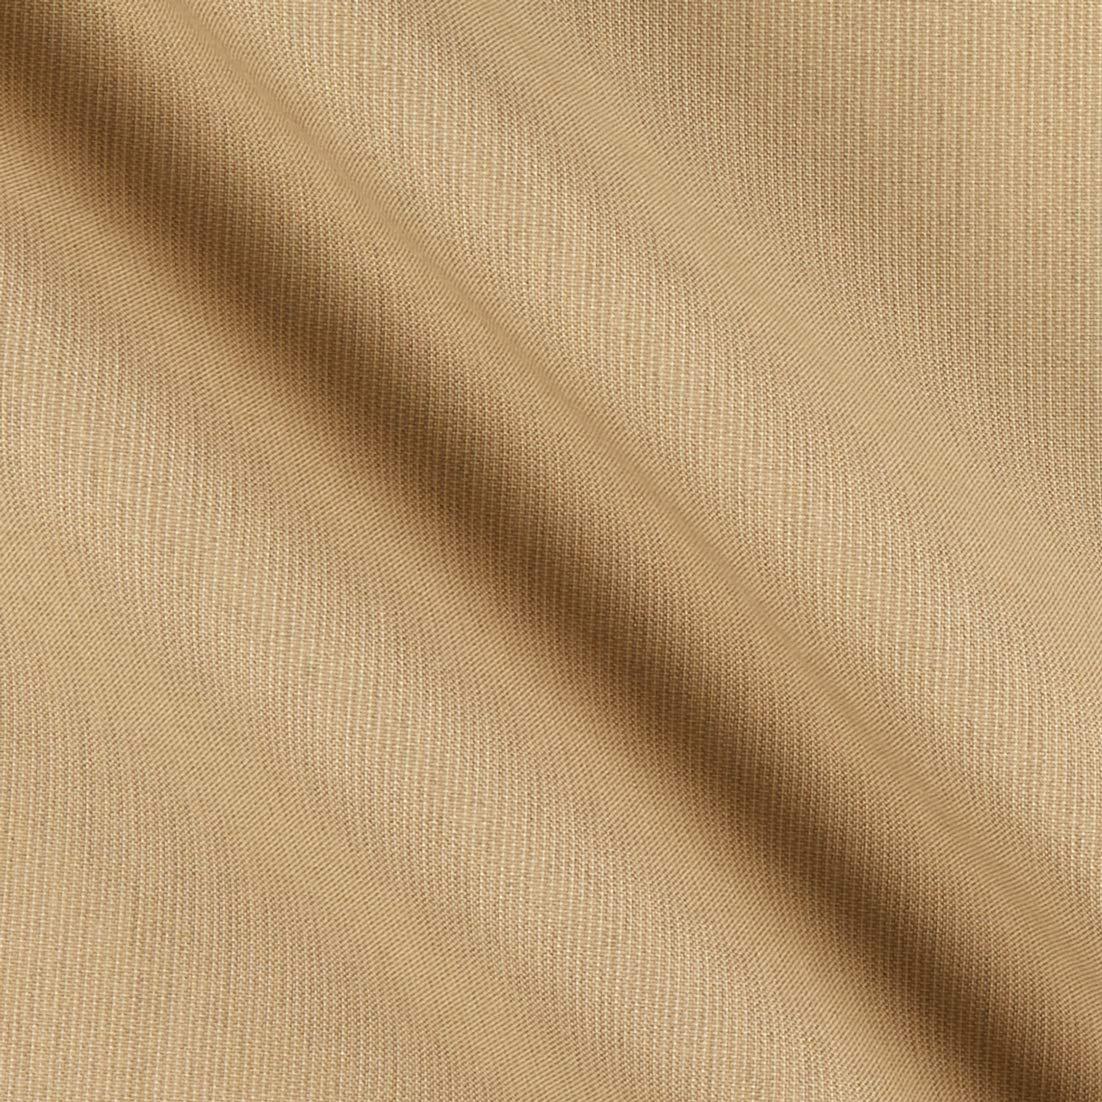 Sunbrella Spectrum Sand Outdoor Canvas Fabric by The Yard, by Sunbrella (Image #1)